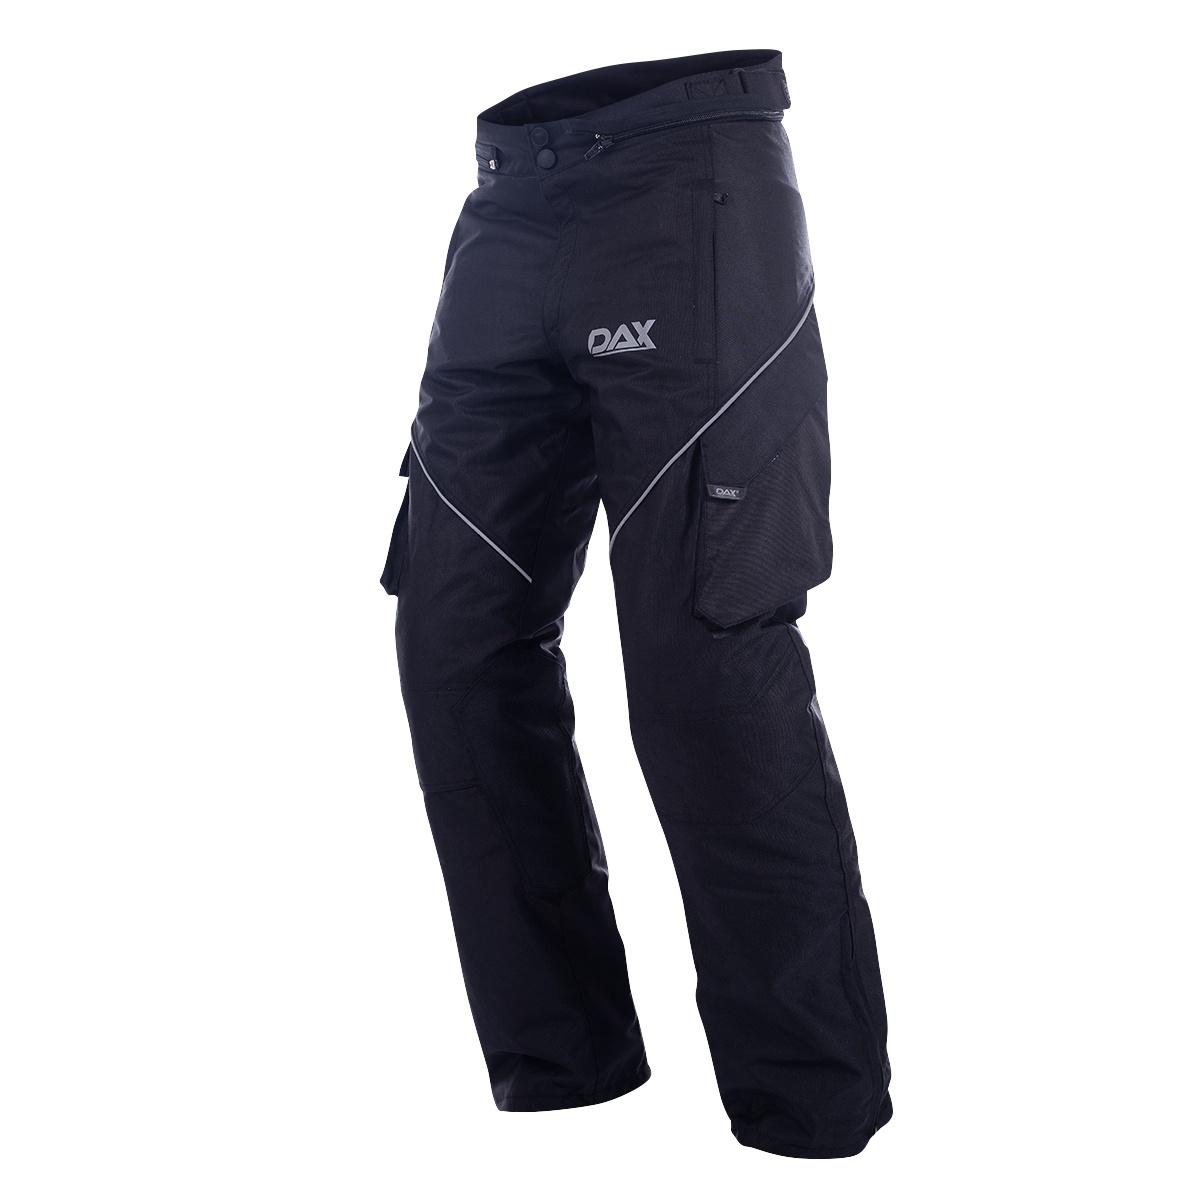 DAX ENDURO kalhoty, MaxDura/Dublan, s chrániči